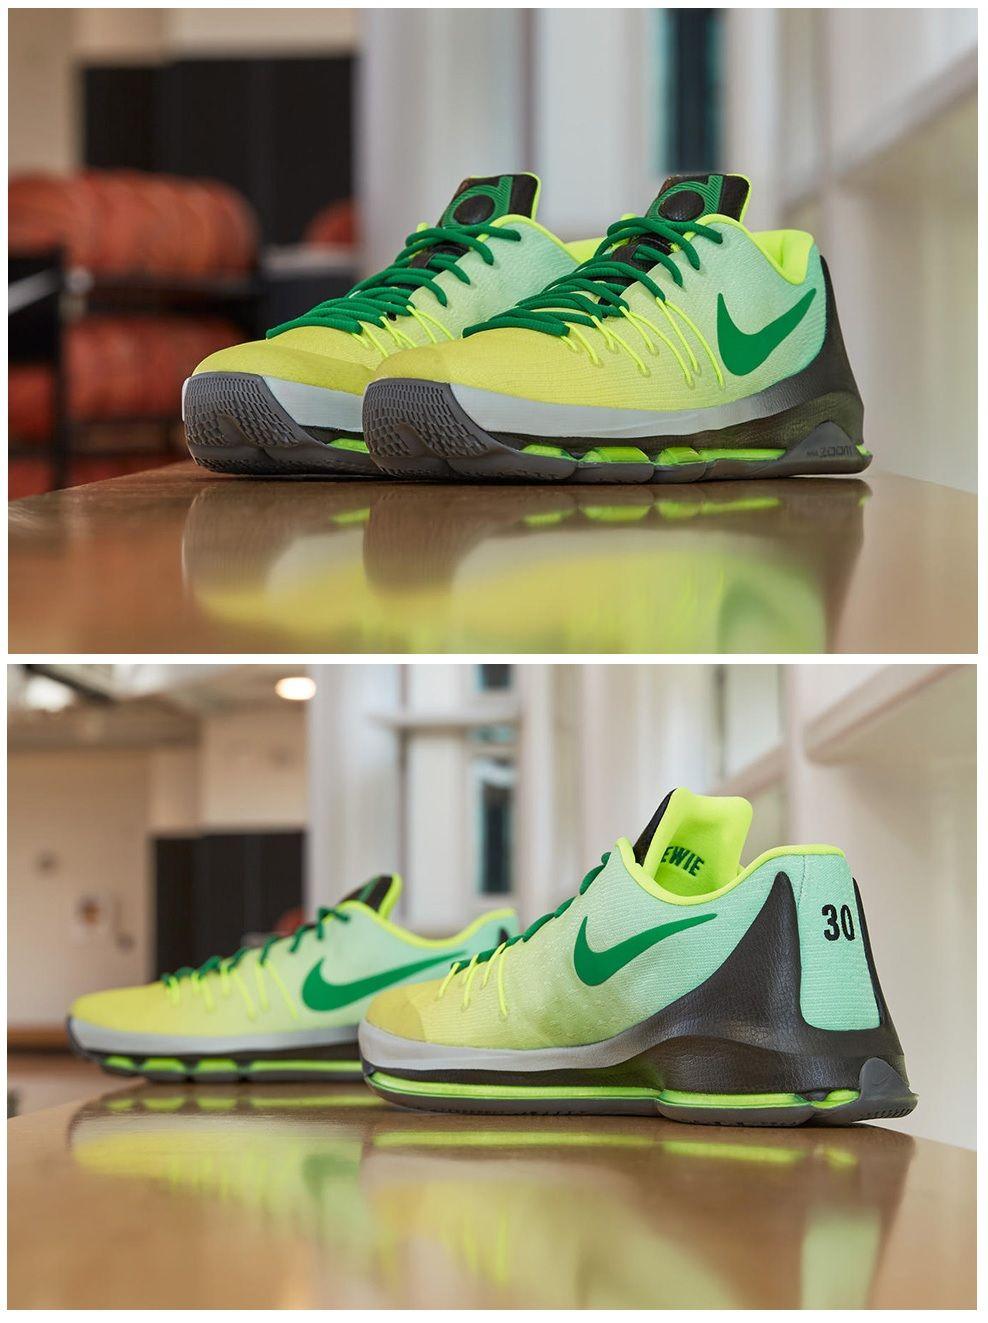 e7b7238c079c Nike KD 8 Seattle Storm PE for Breanna Stewart Nike Basketball Shoes